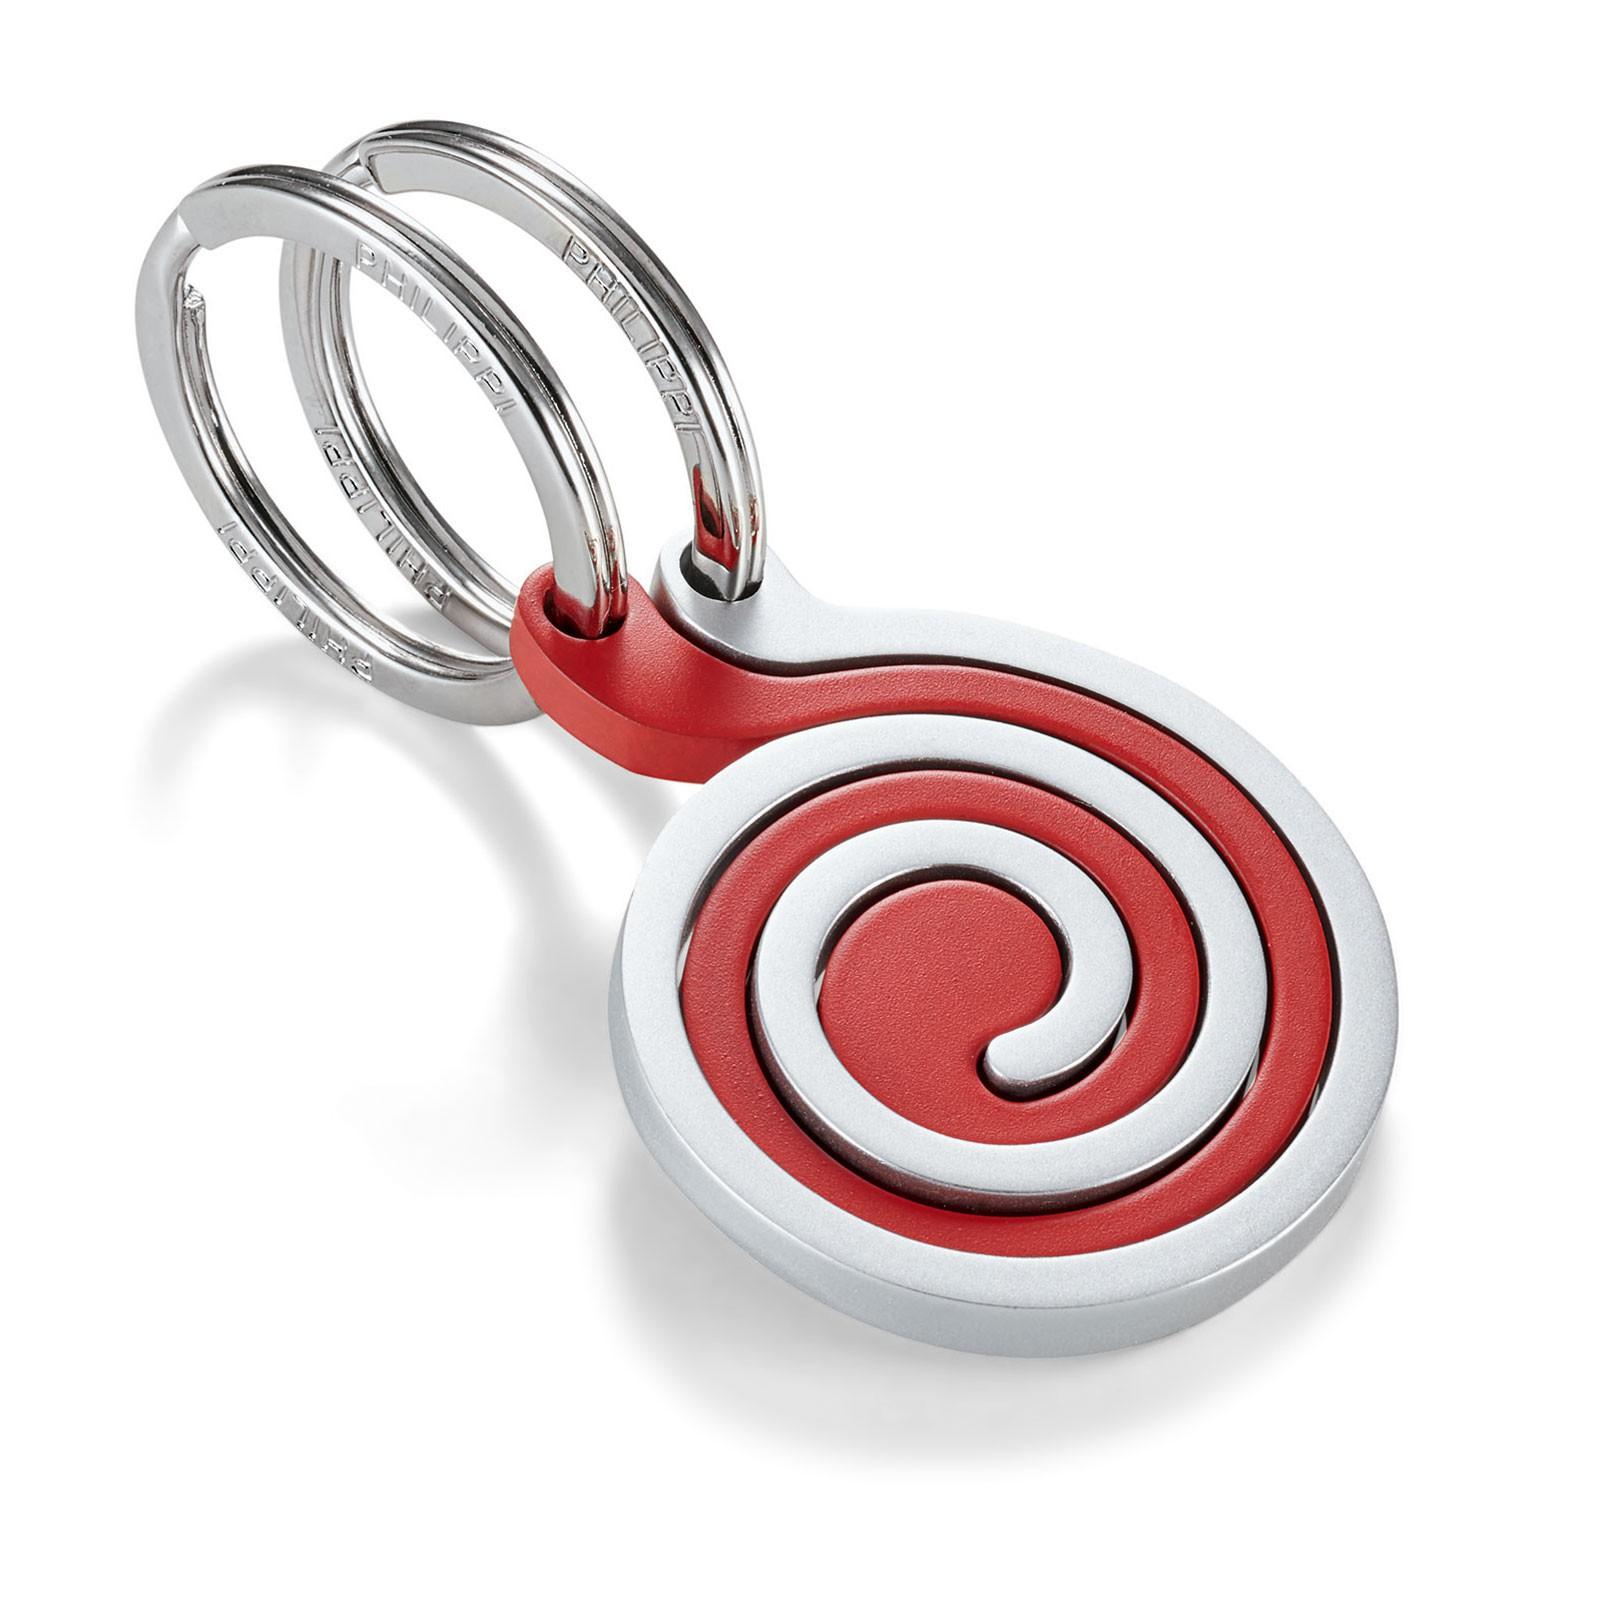 Philippi SNAIL Schlüsselanhänger 2-teilig matt silber rot lackiert